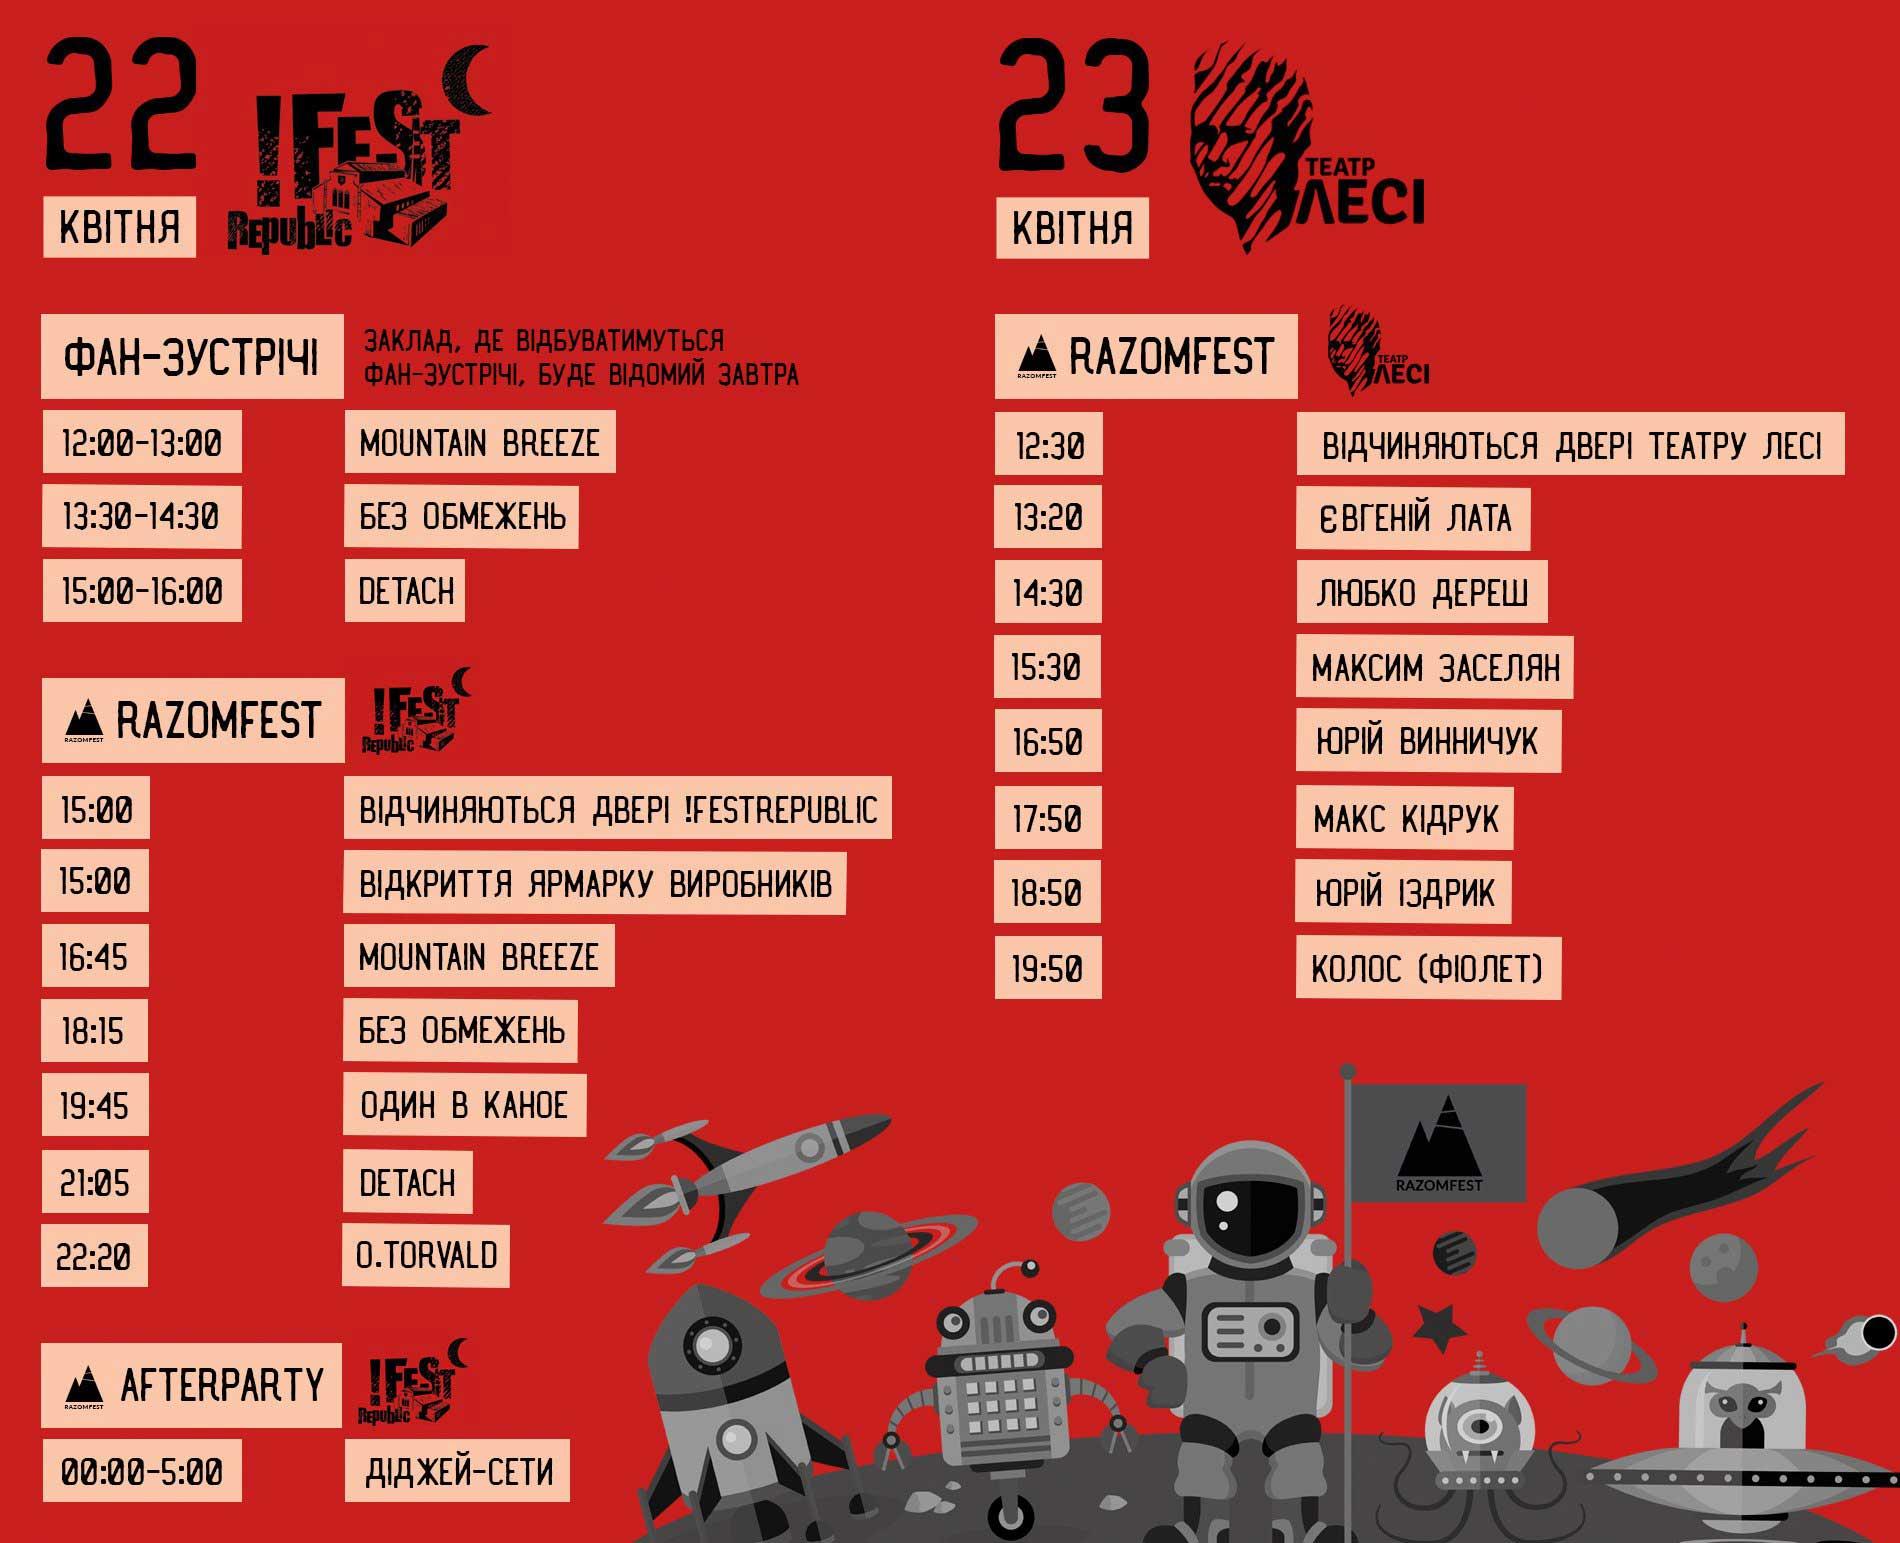 Lviv RazomFest, Lviv mayıs 2017 festival, Lviv razomfest, ukrayna lviv mayıs etkinlikleri, Razom Fest, разом фест львів, разом фест 2017 львів квитки, разомфест 2017